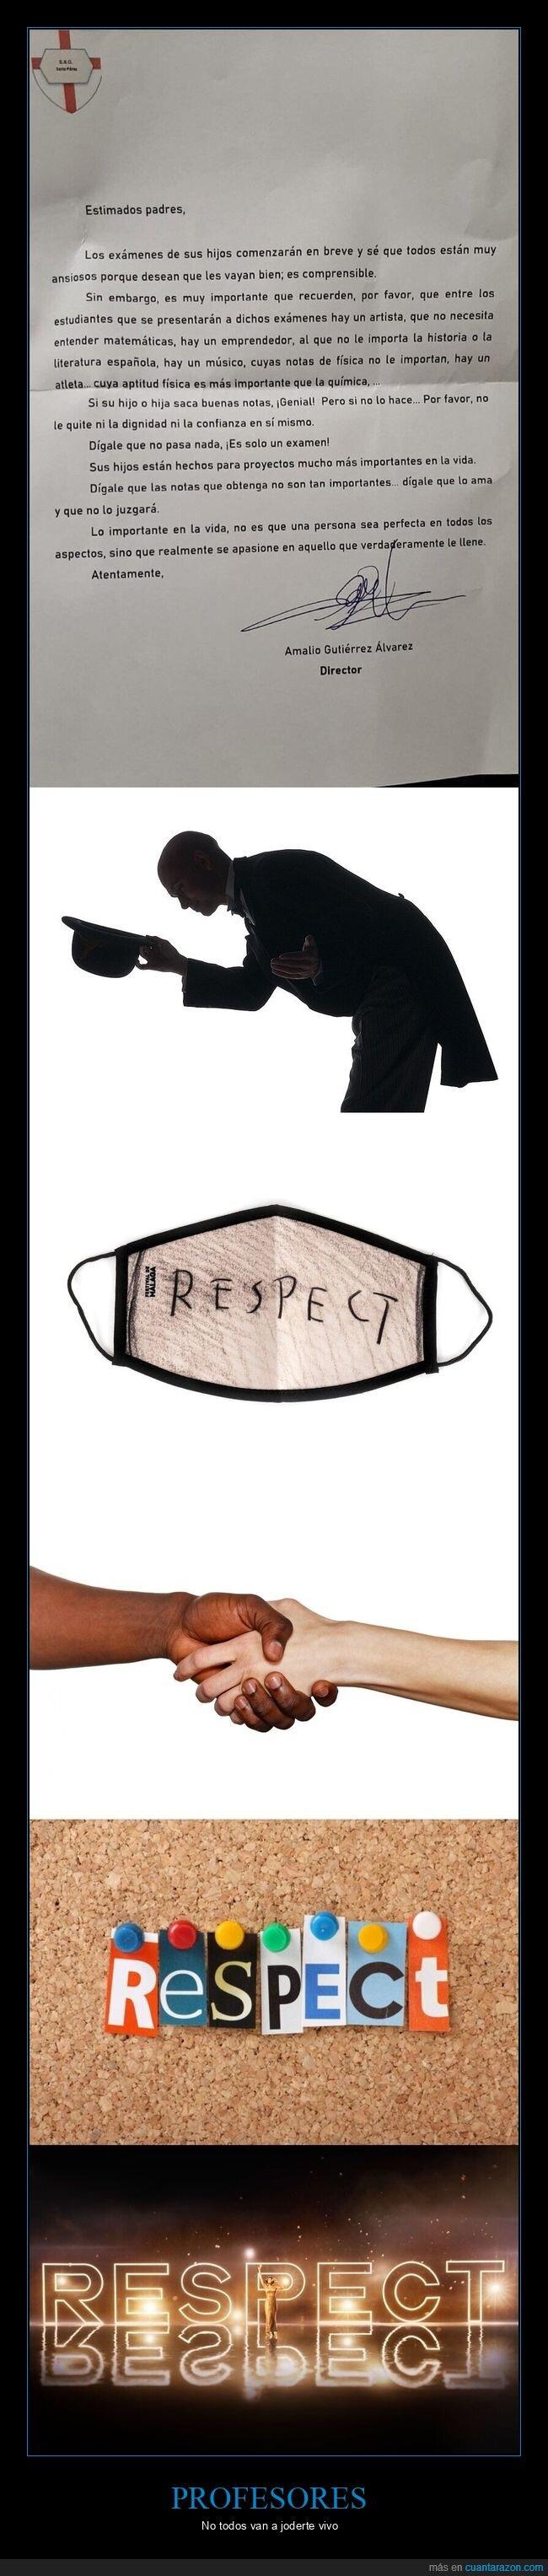 carta,examenes,profesor,respect